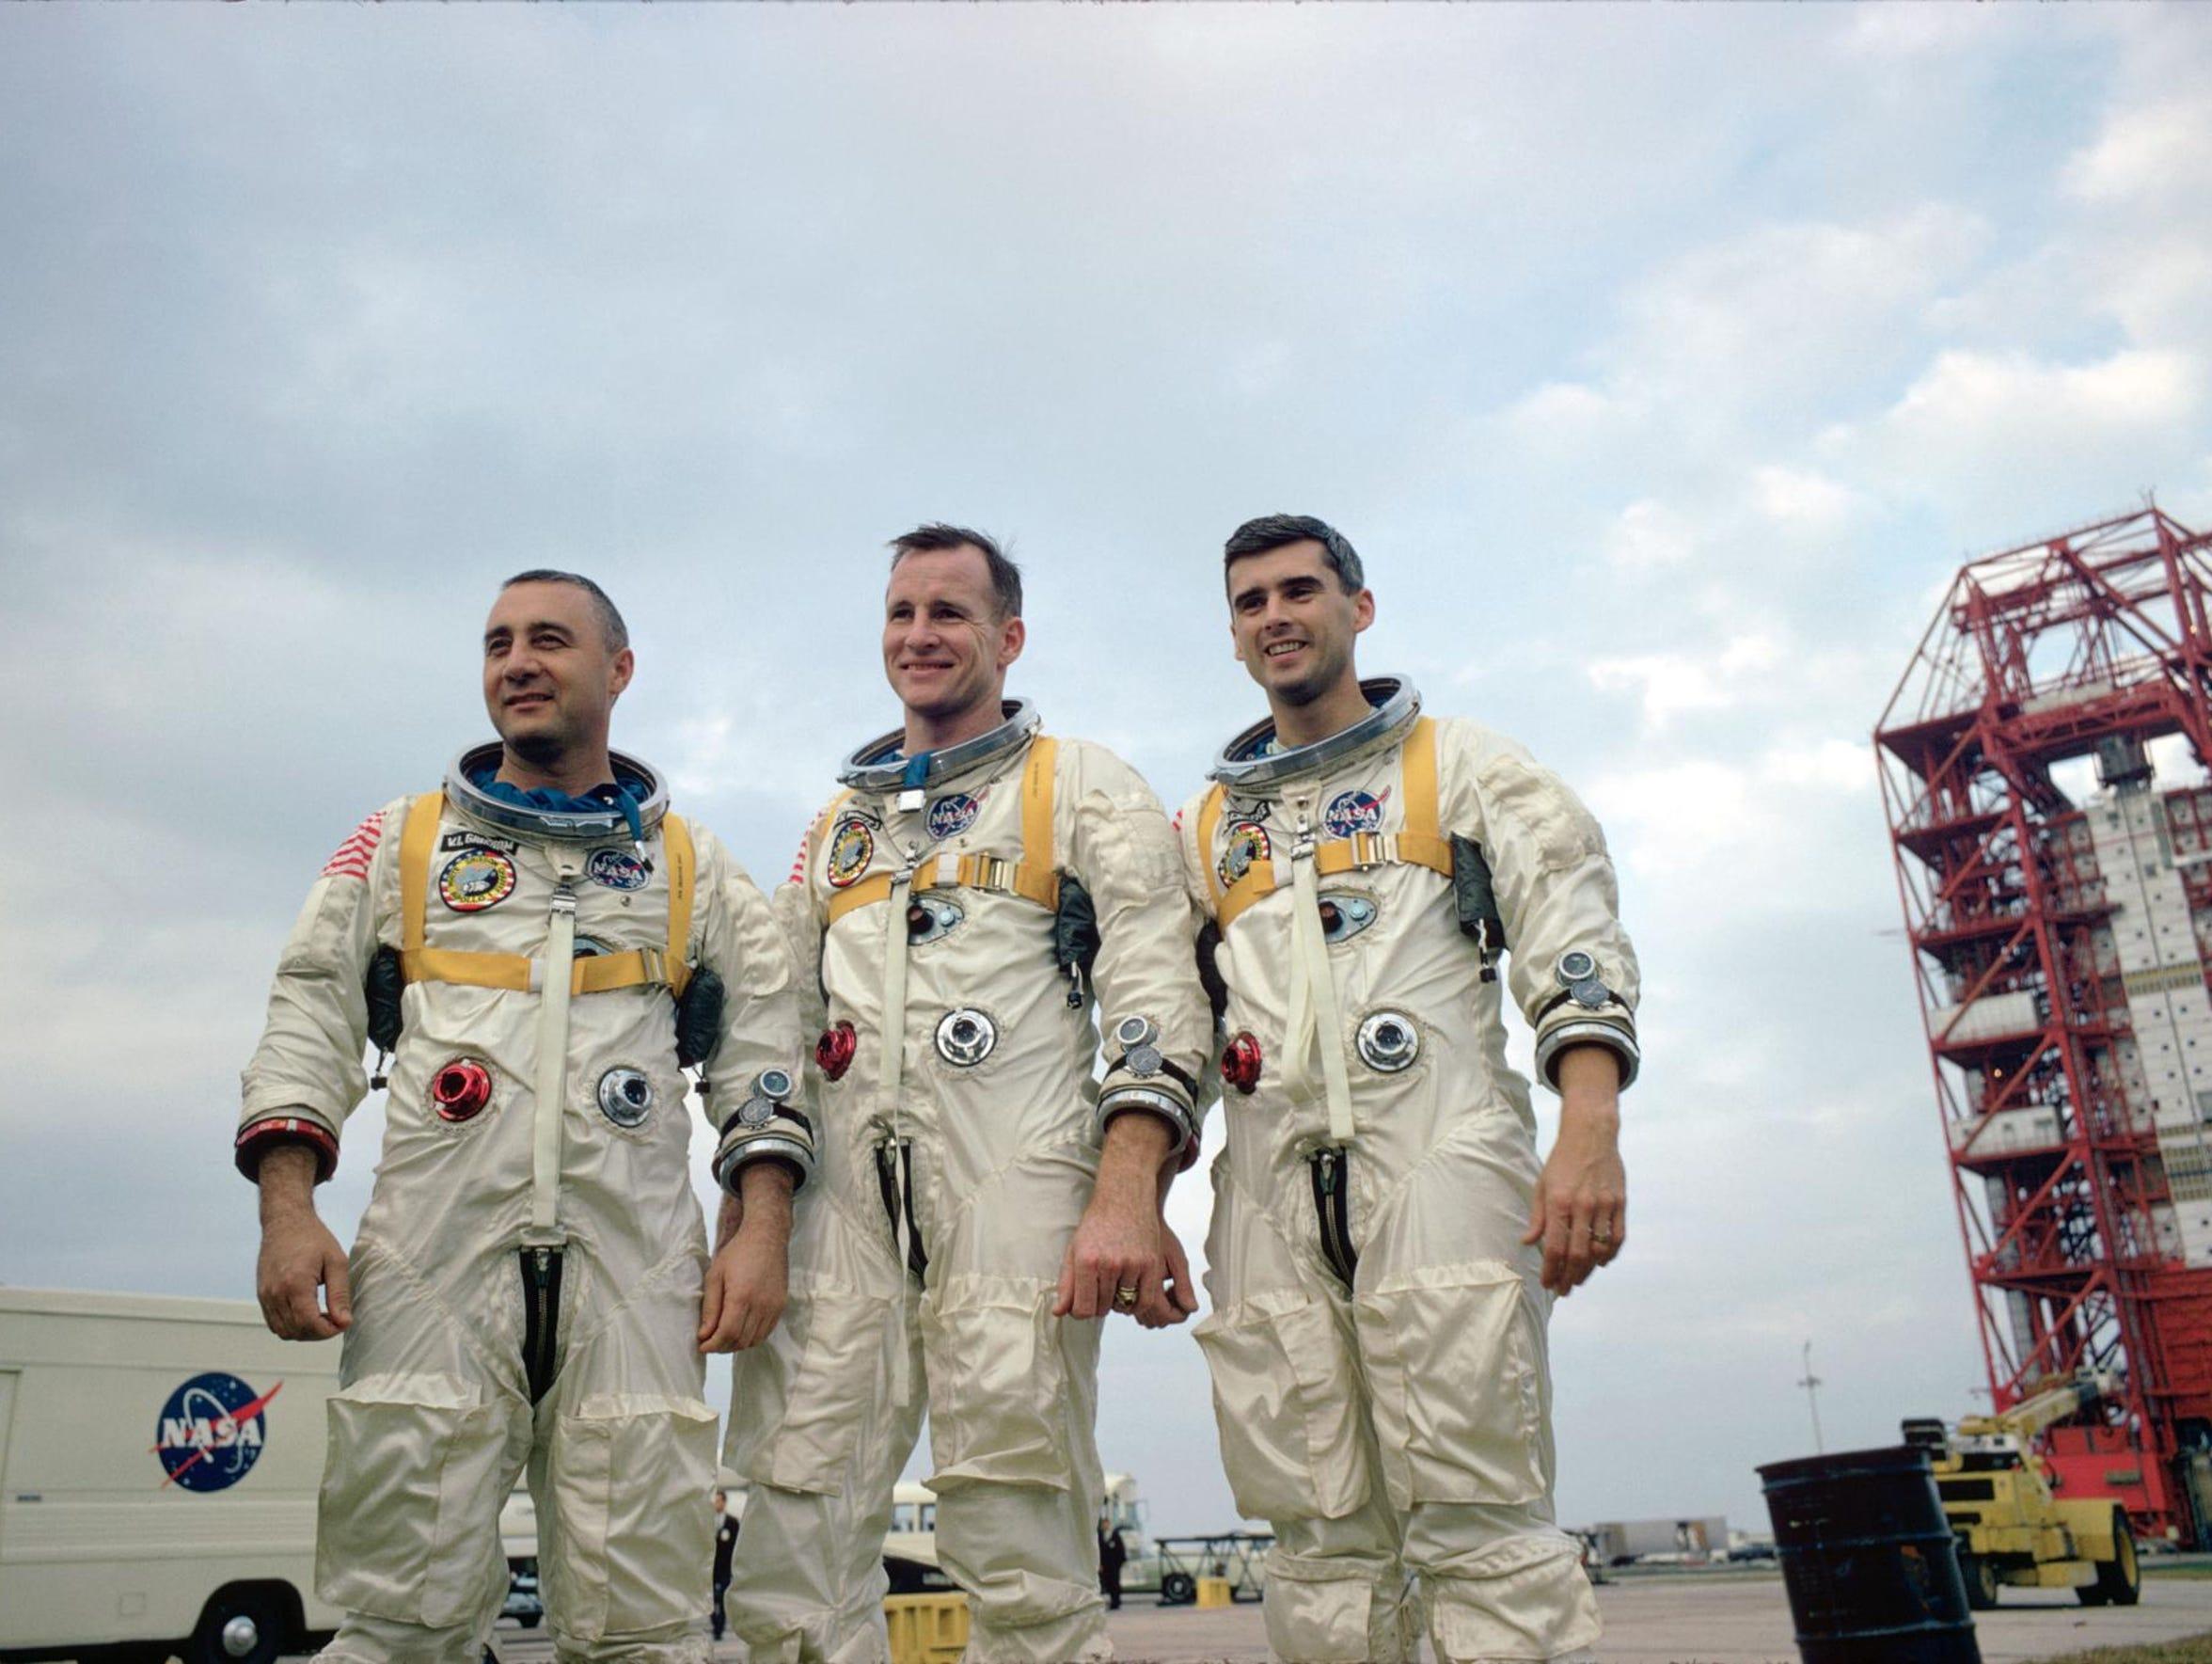 January 1967. The prime crew of the National Aeronautics